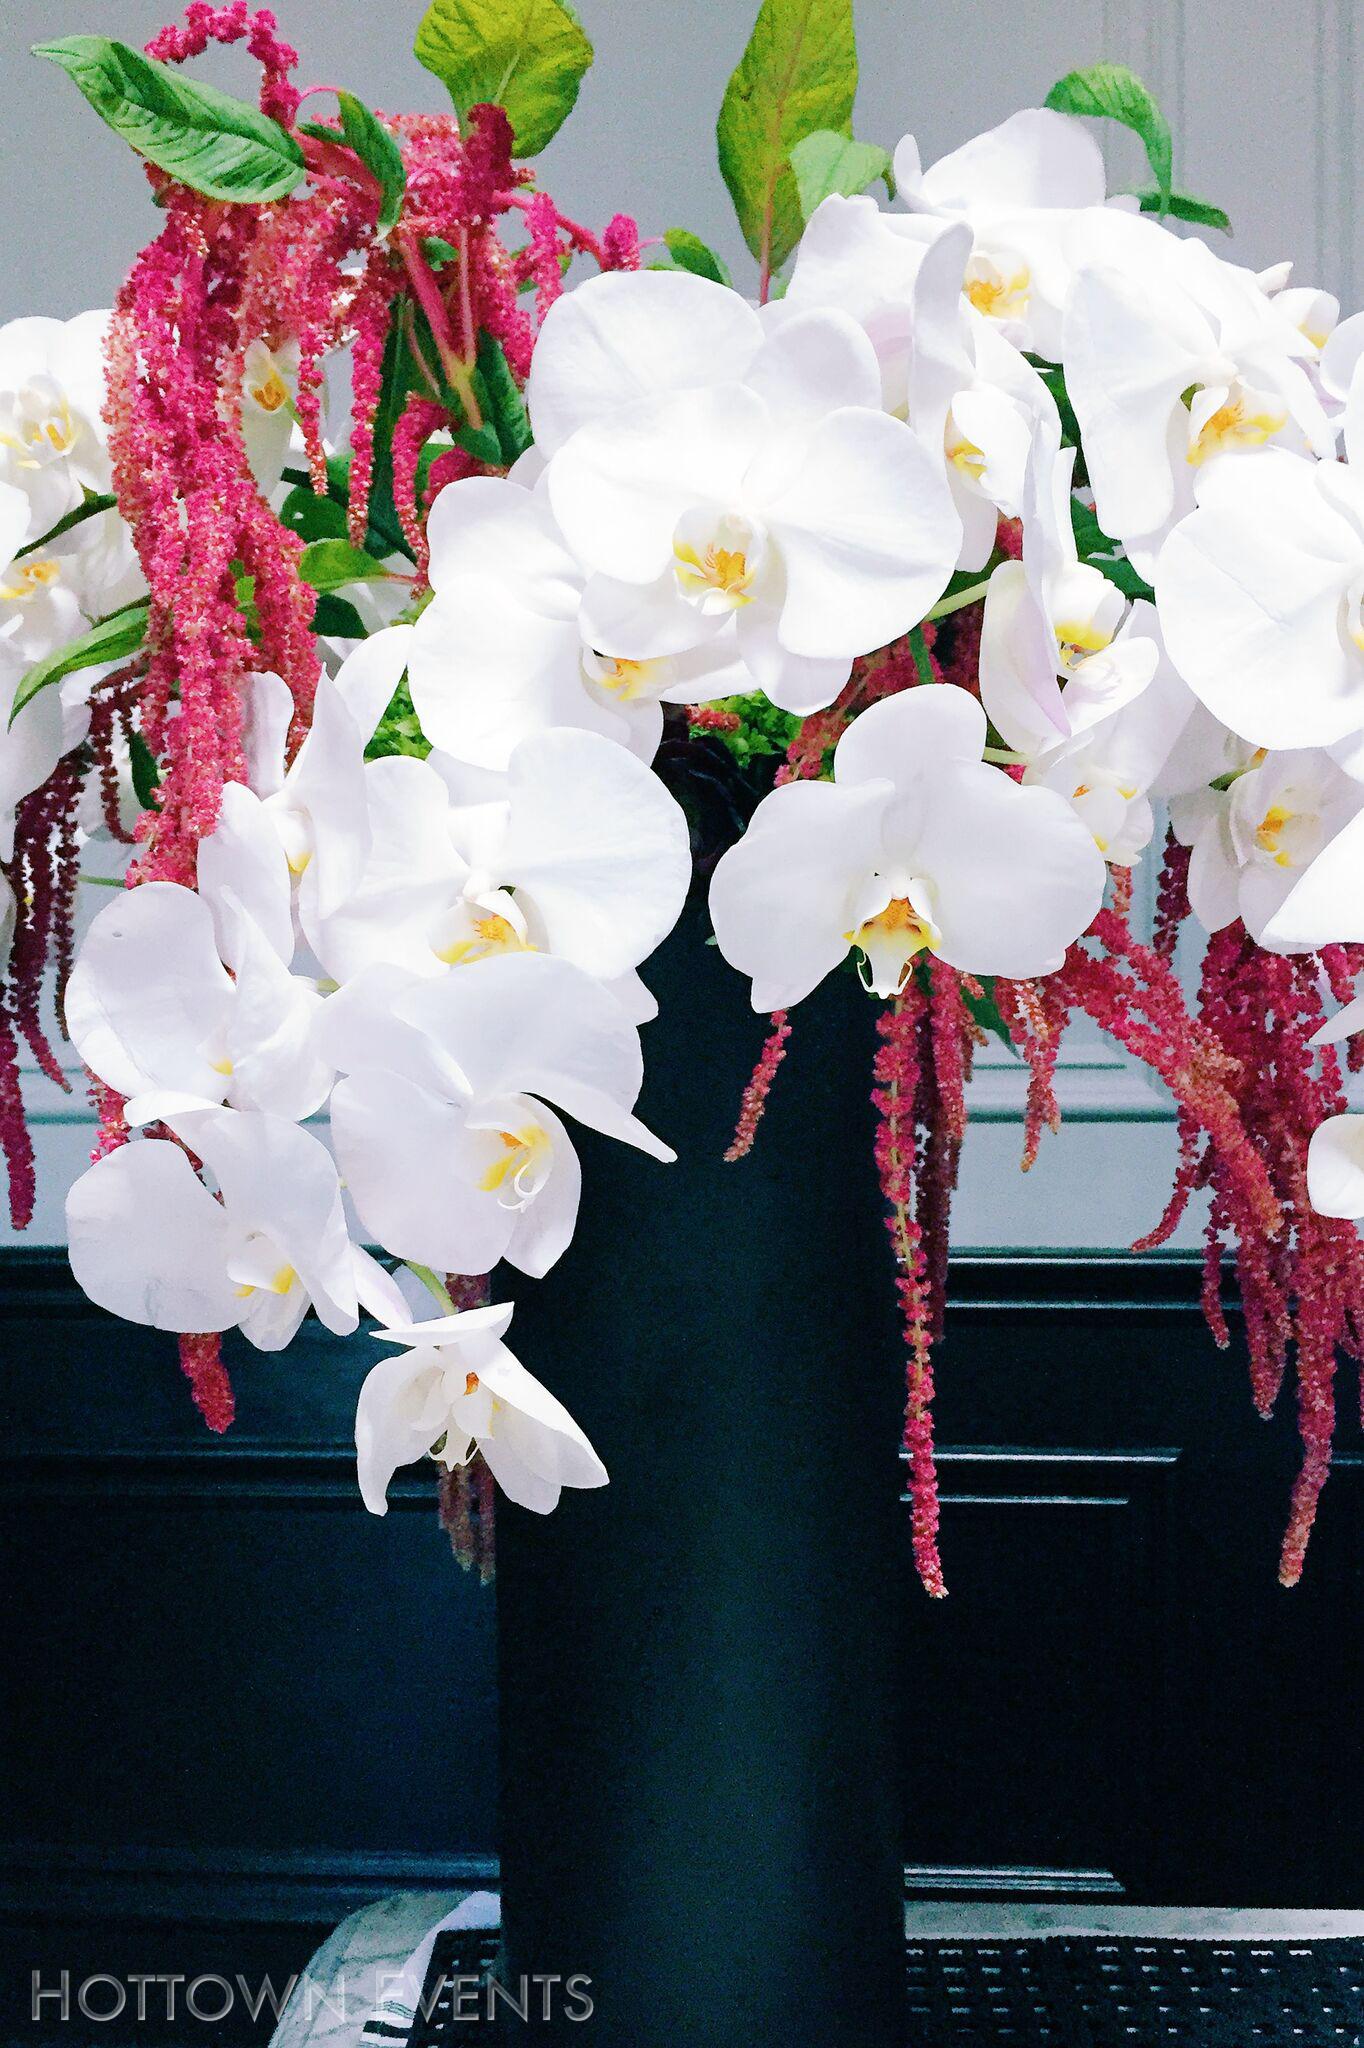 <h5>Medium Orchid table top arrangement</h5>